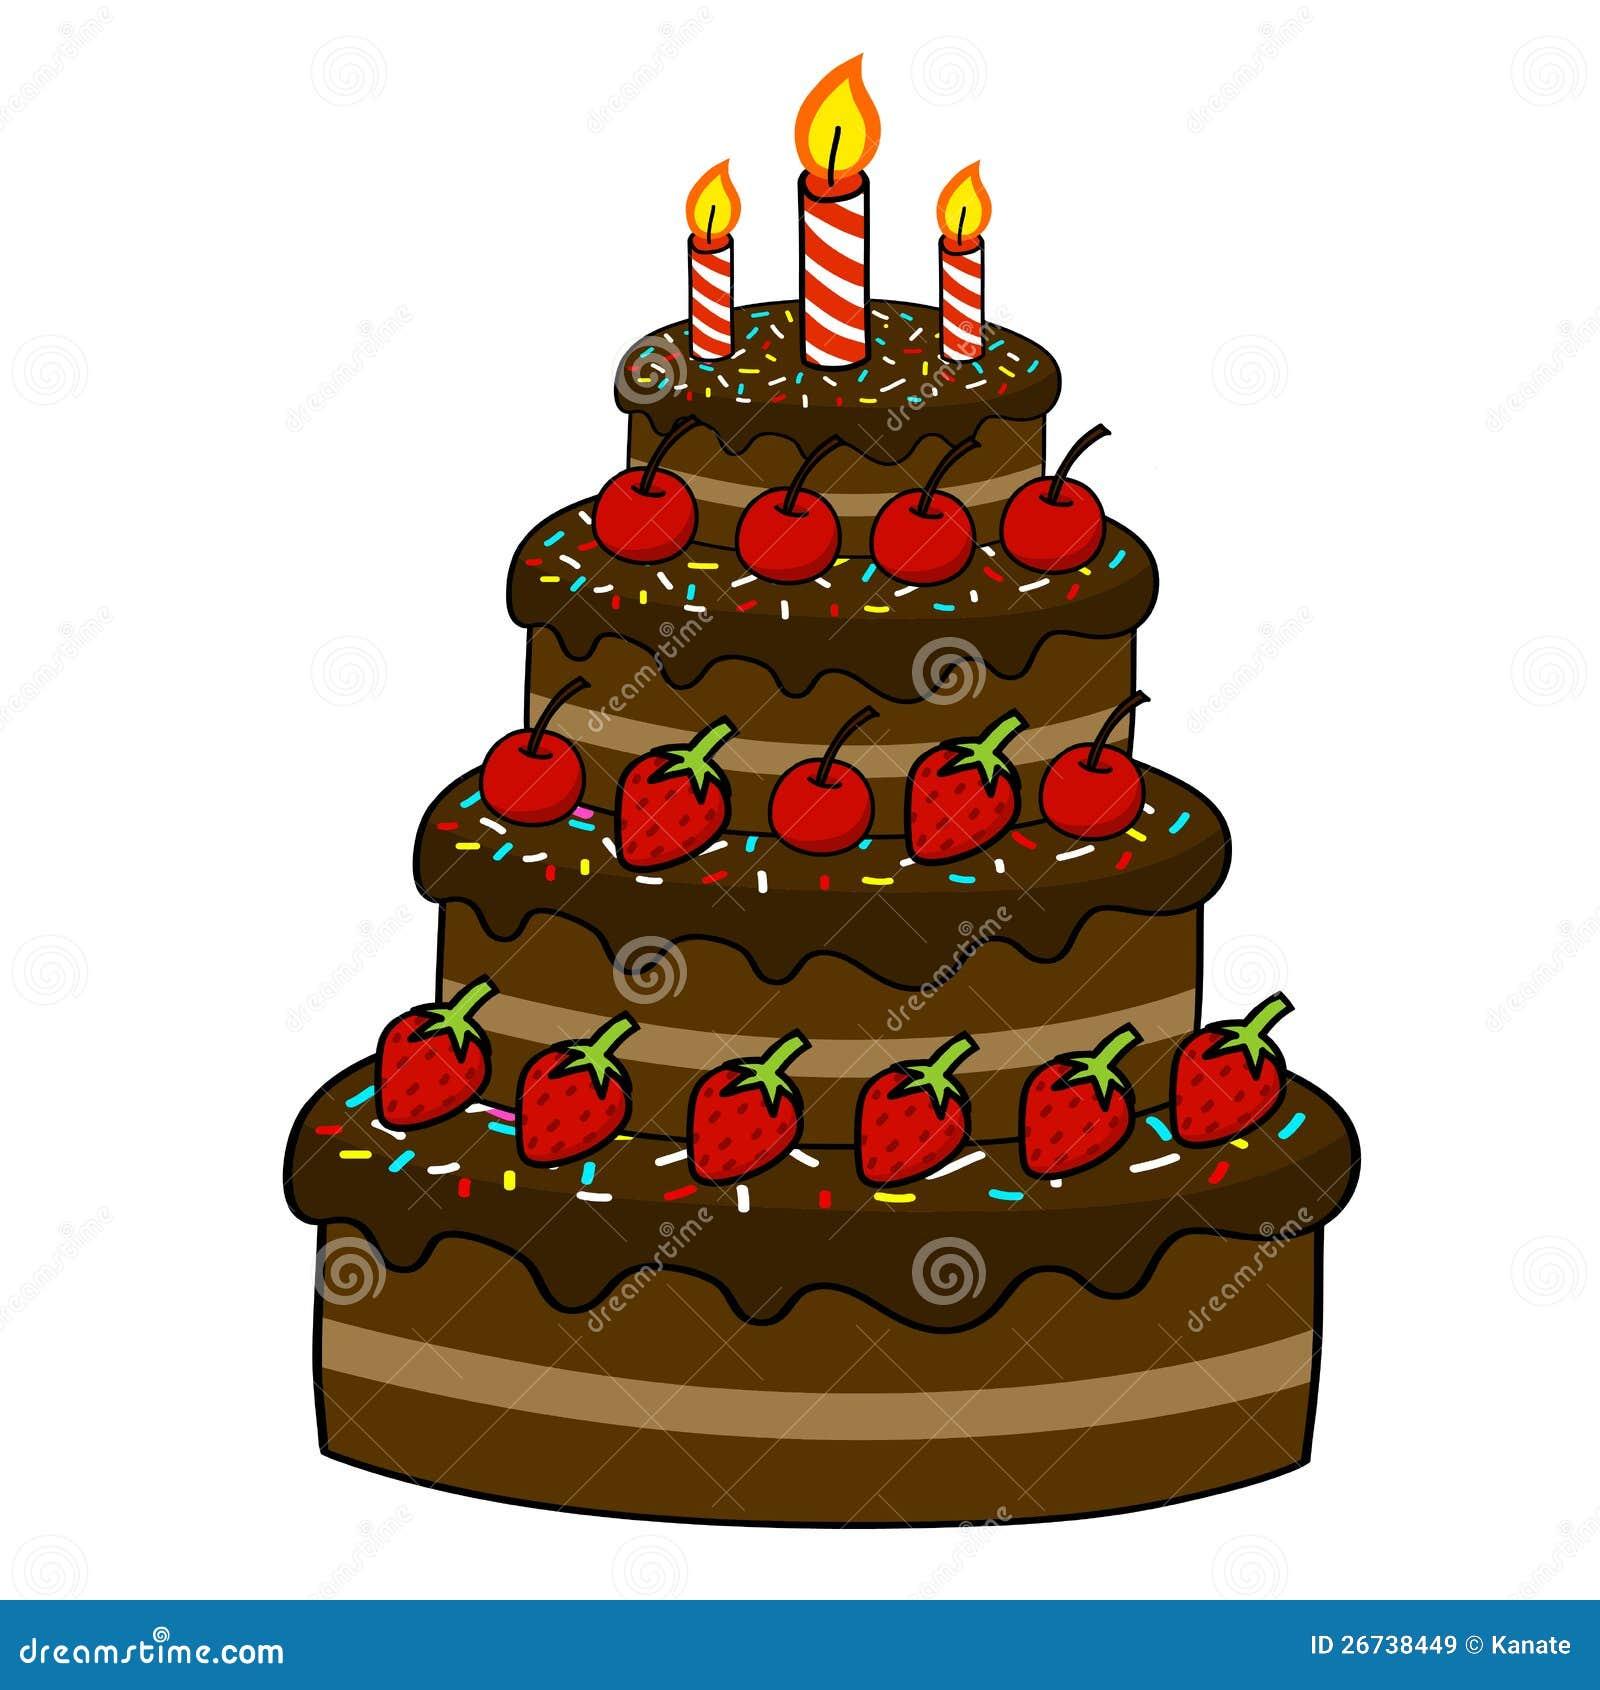 Cake Decoration Cartoon : Cartoon cake hand drawing stock vector. Image of element ...